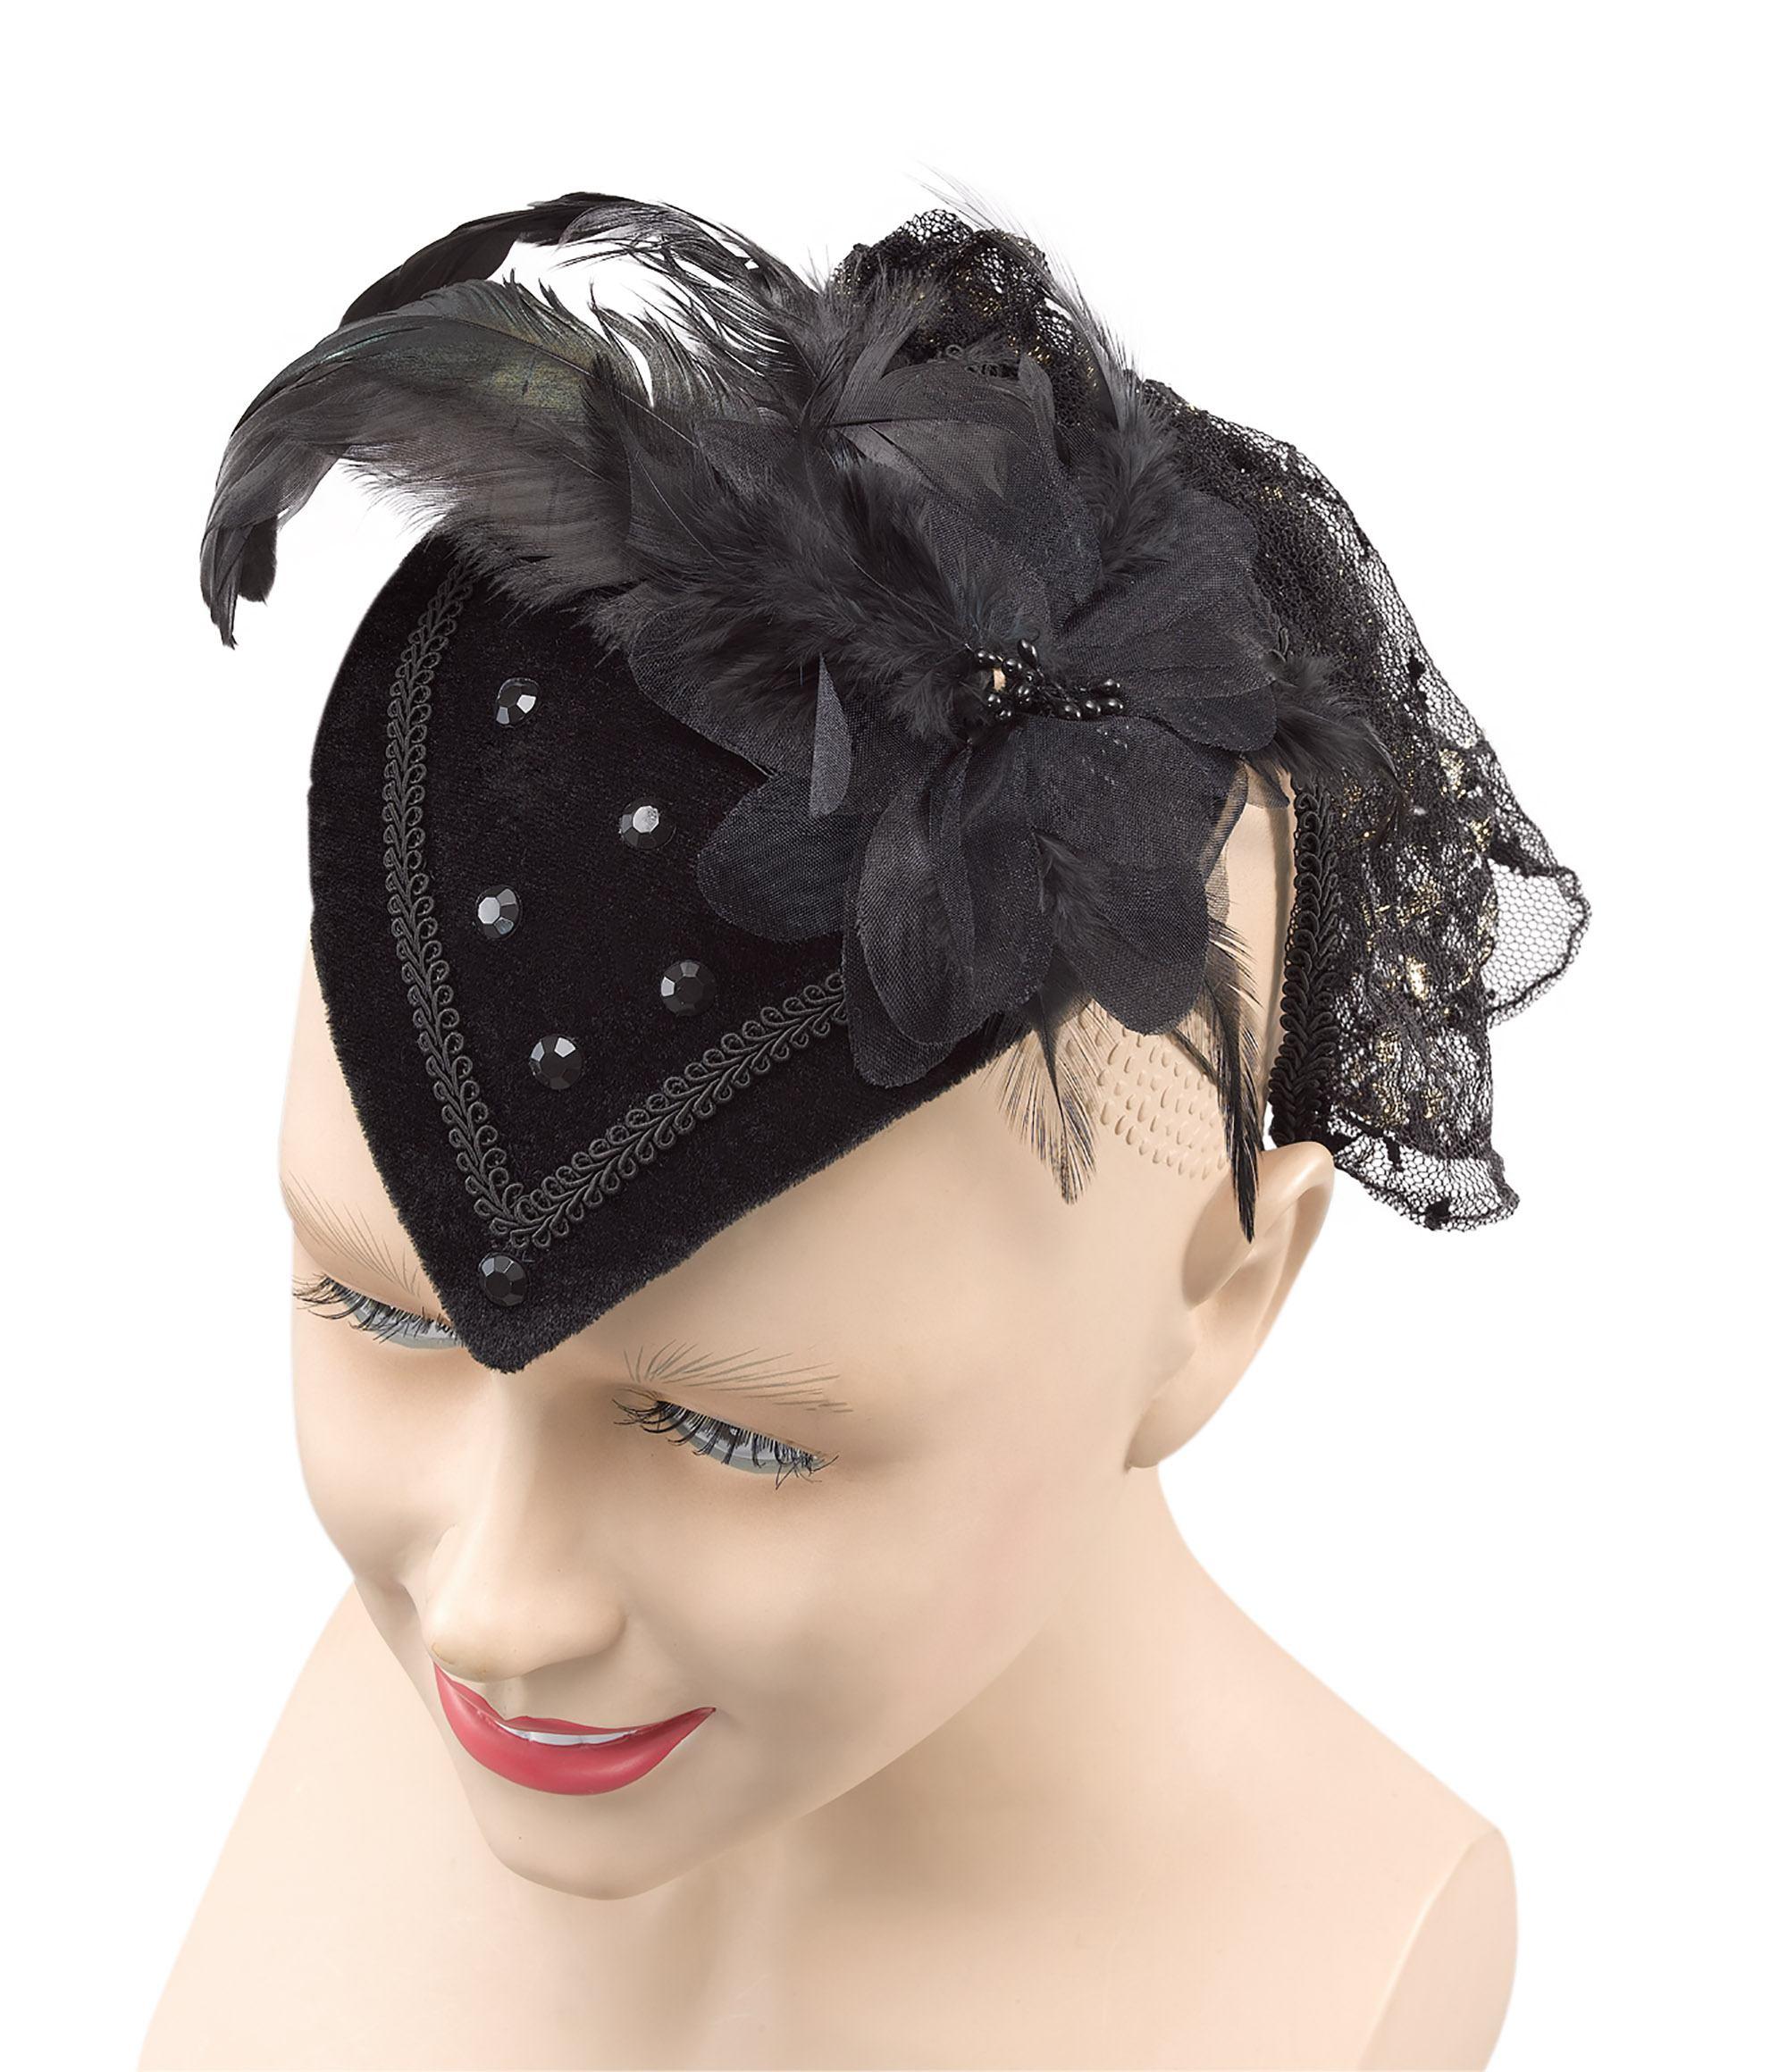 66913236161 New Black Riding Teardrop Hat 5051090040075